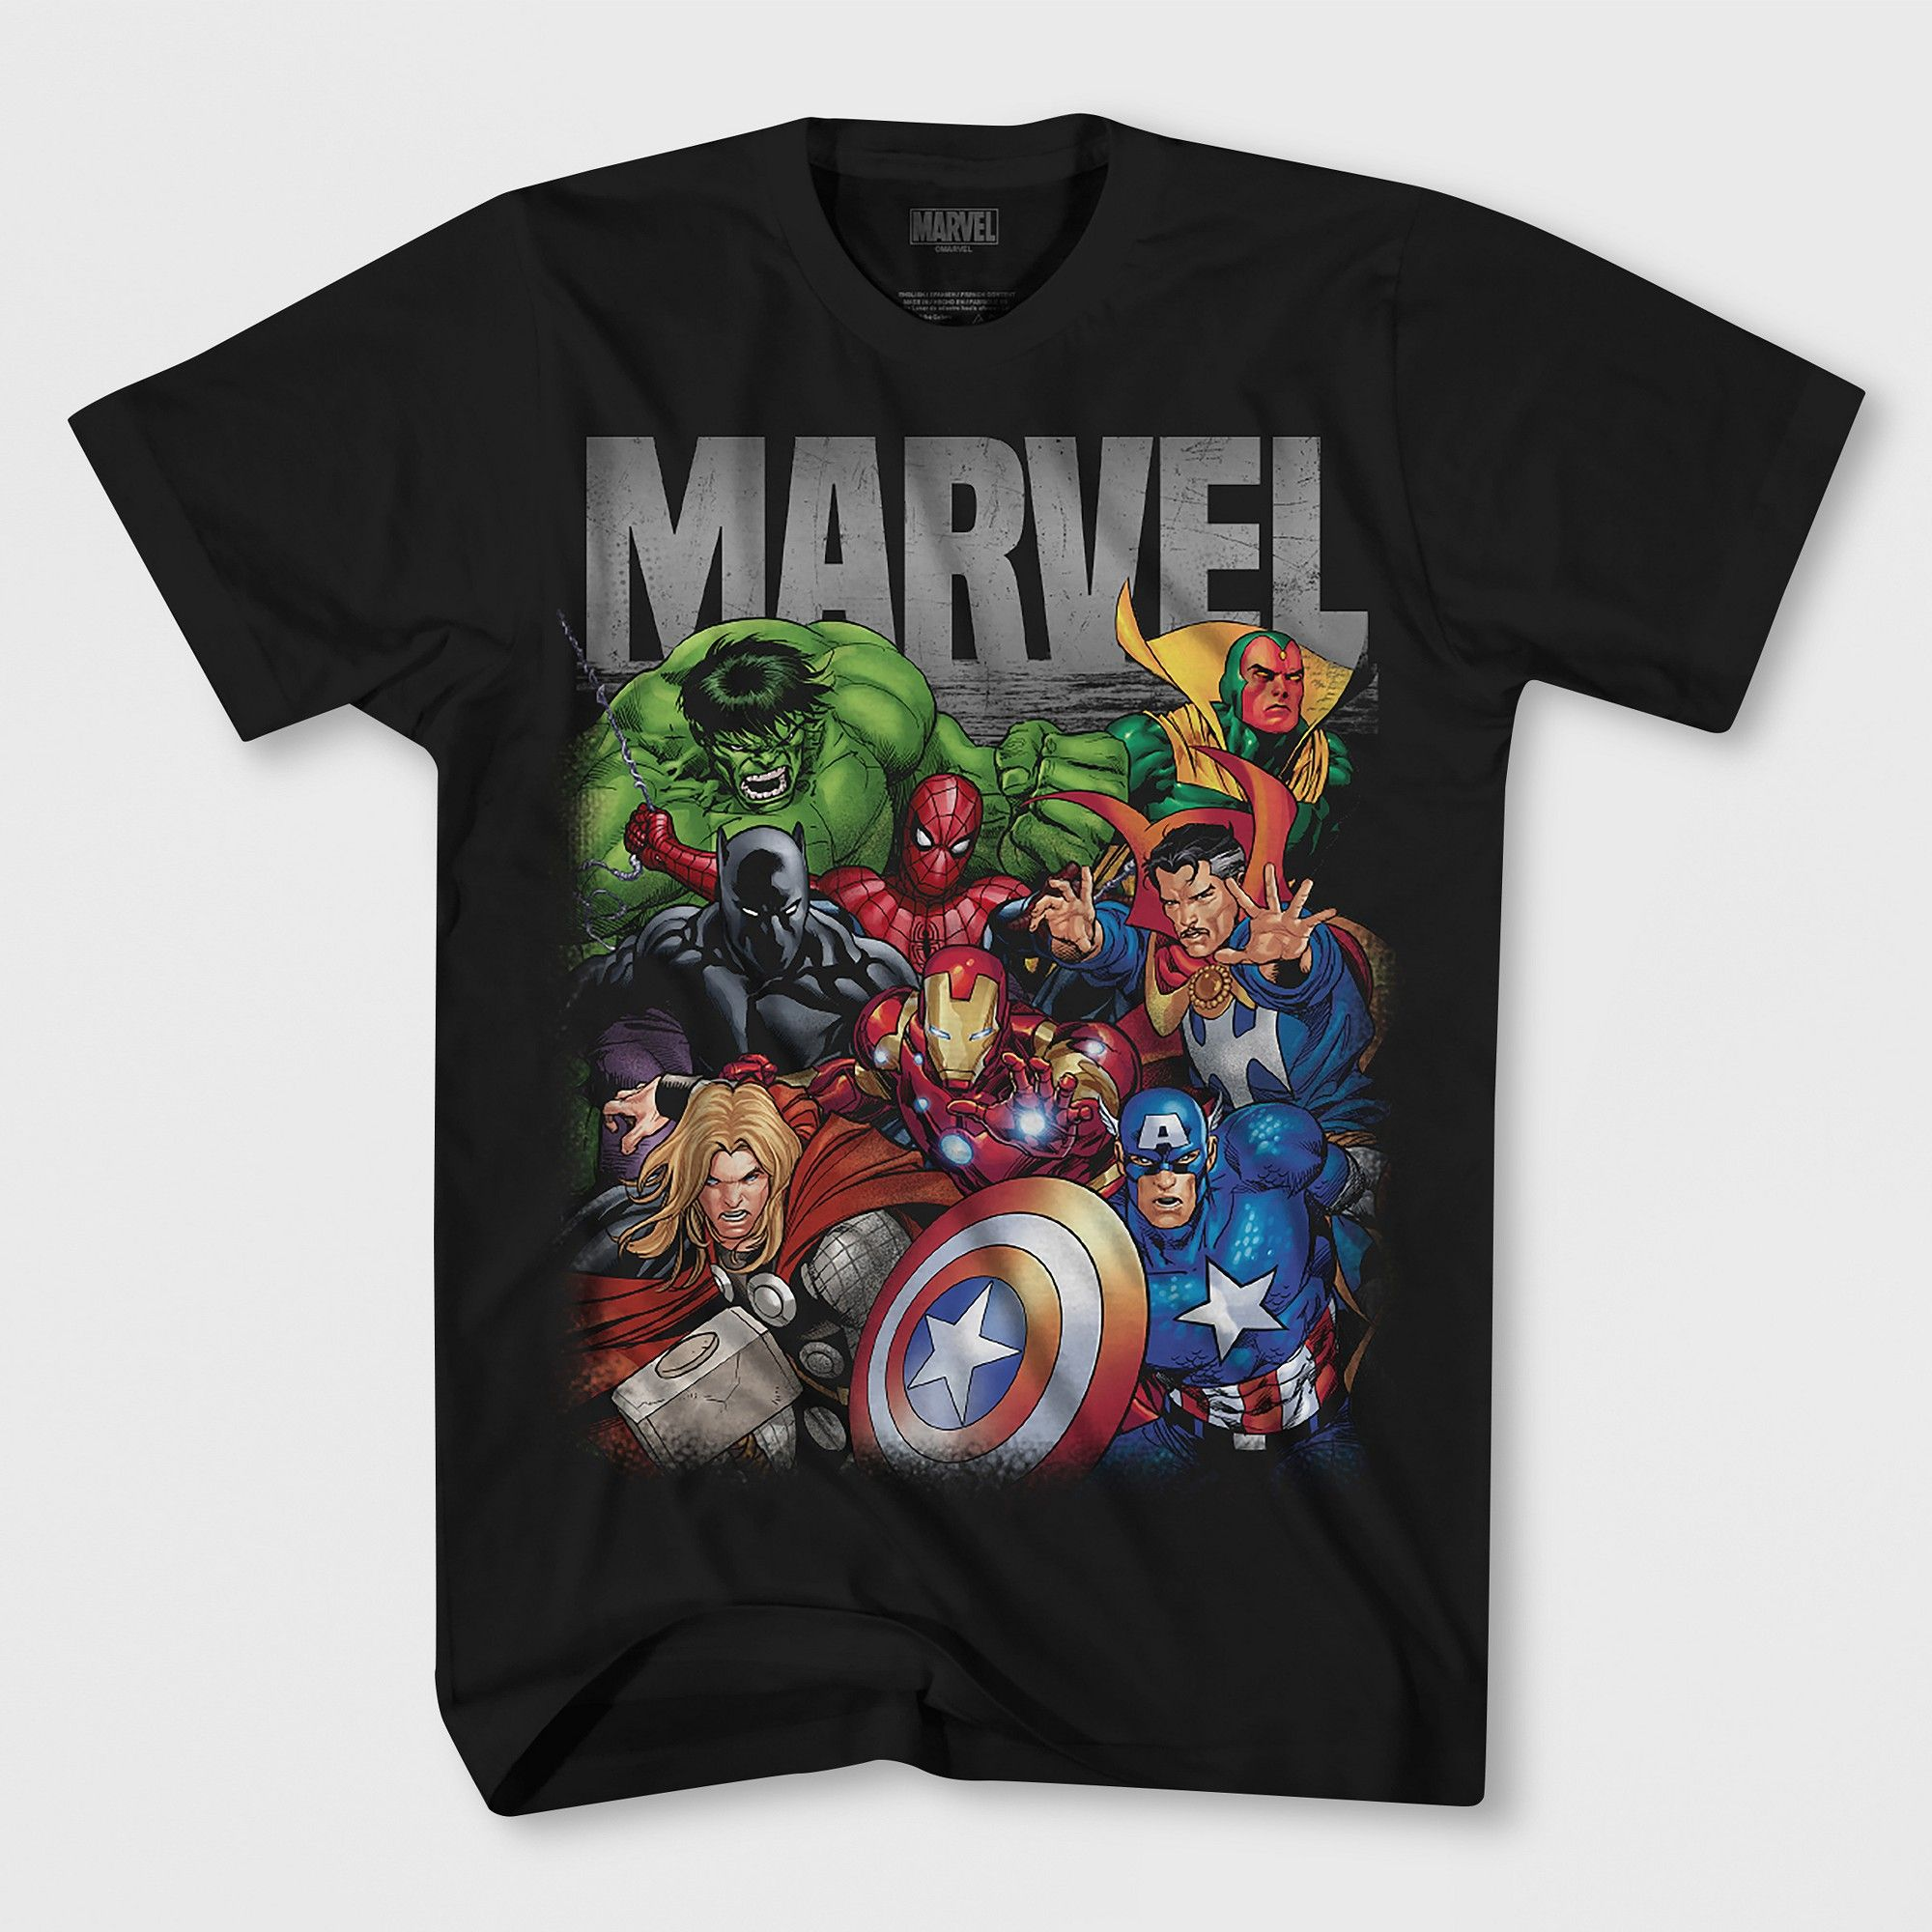 Ropa de niña (2 16 años) Marvel niñas Hulk Krunch Camiseta